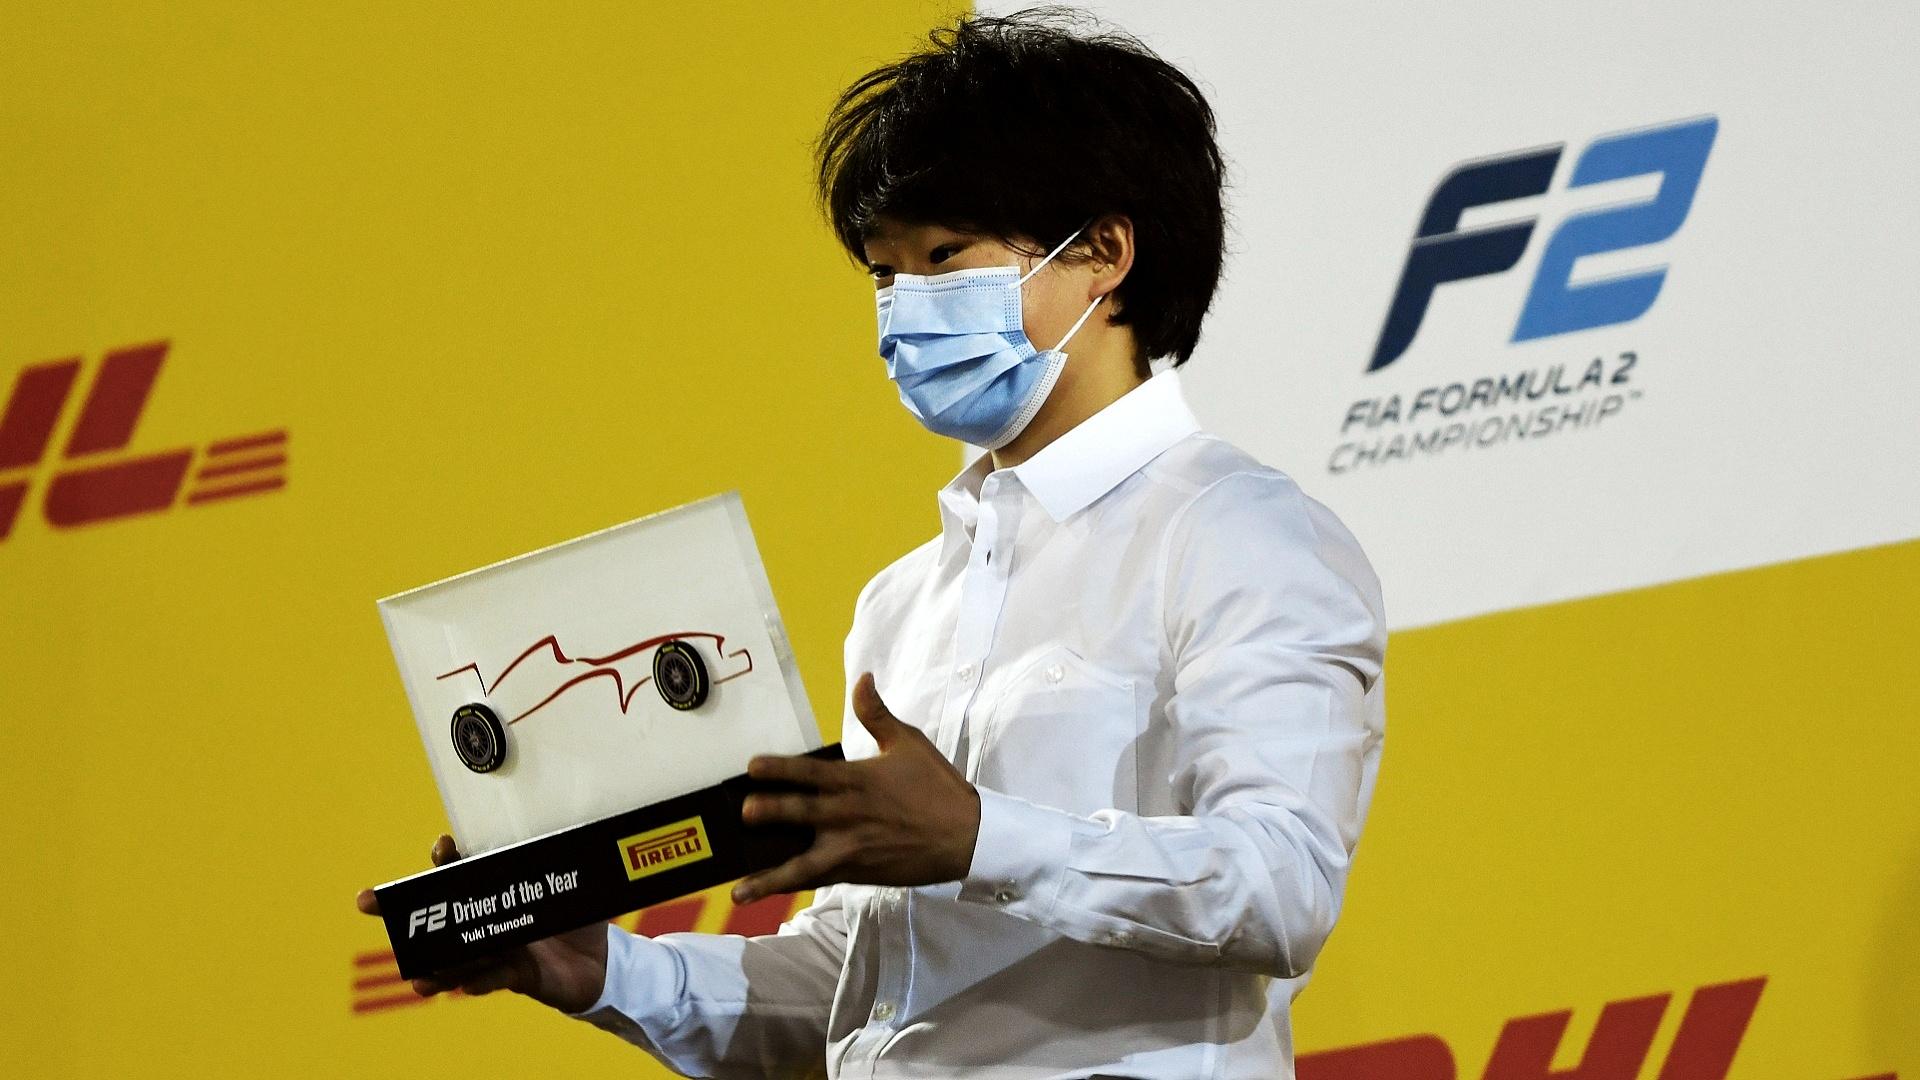 2020-12-09 Tsunoda Yuki F2 Formula 2